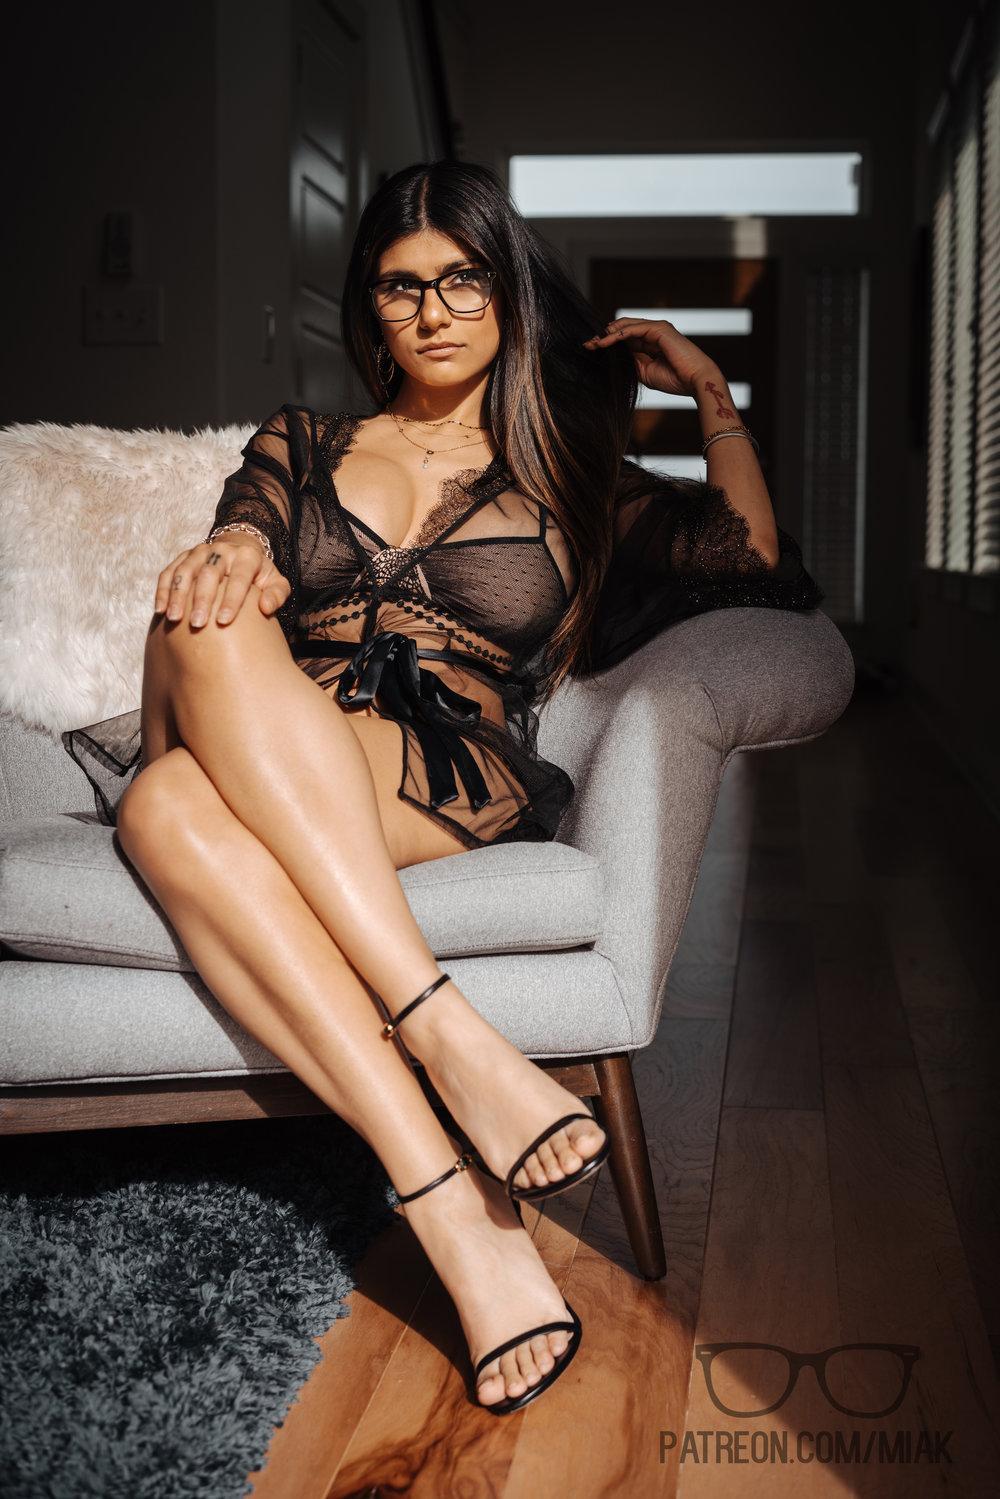 Mia Khalifa Lingerie Stiletto Heels Photoshoot Leaked 0025